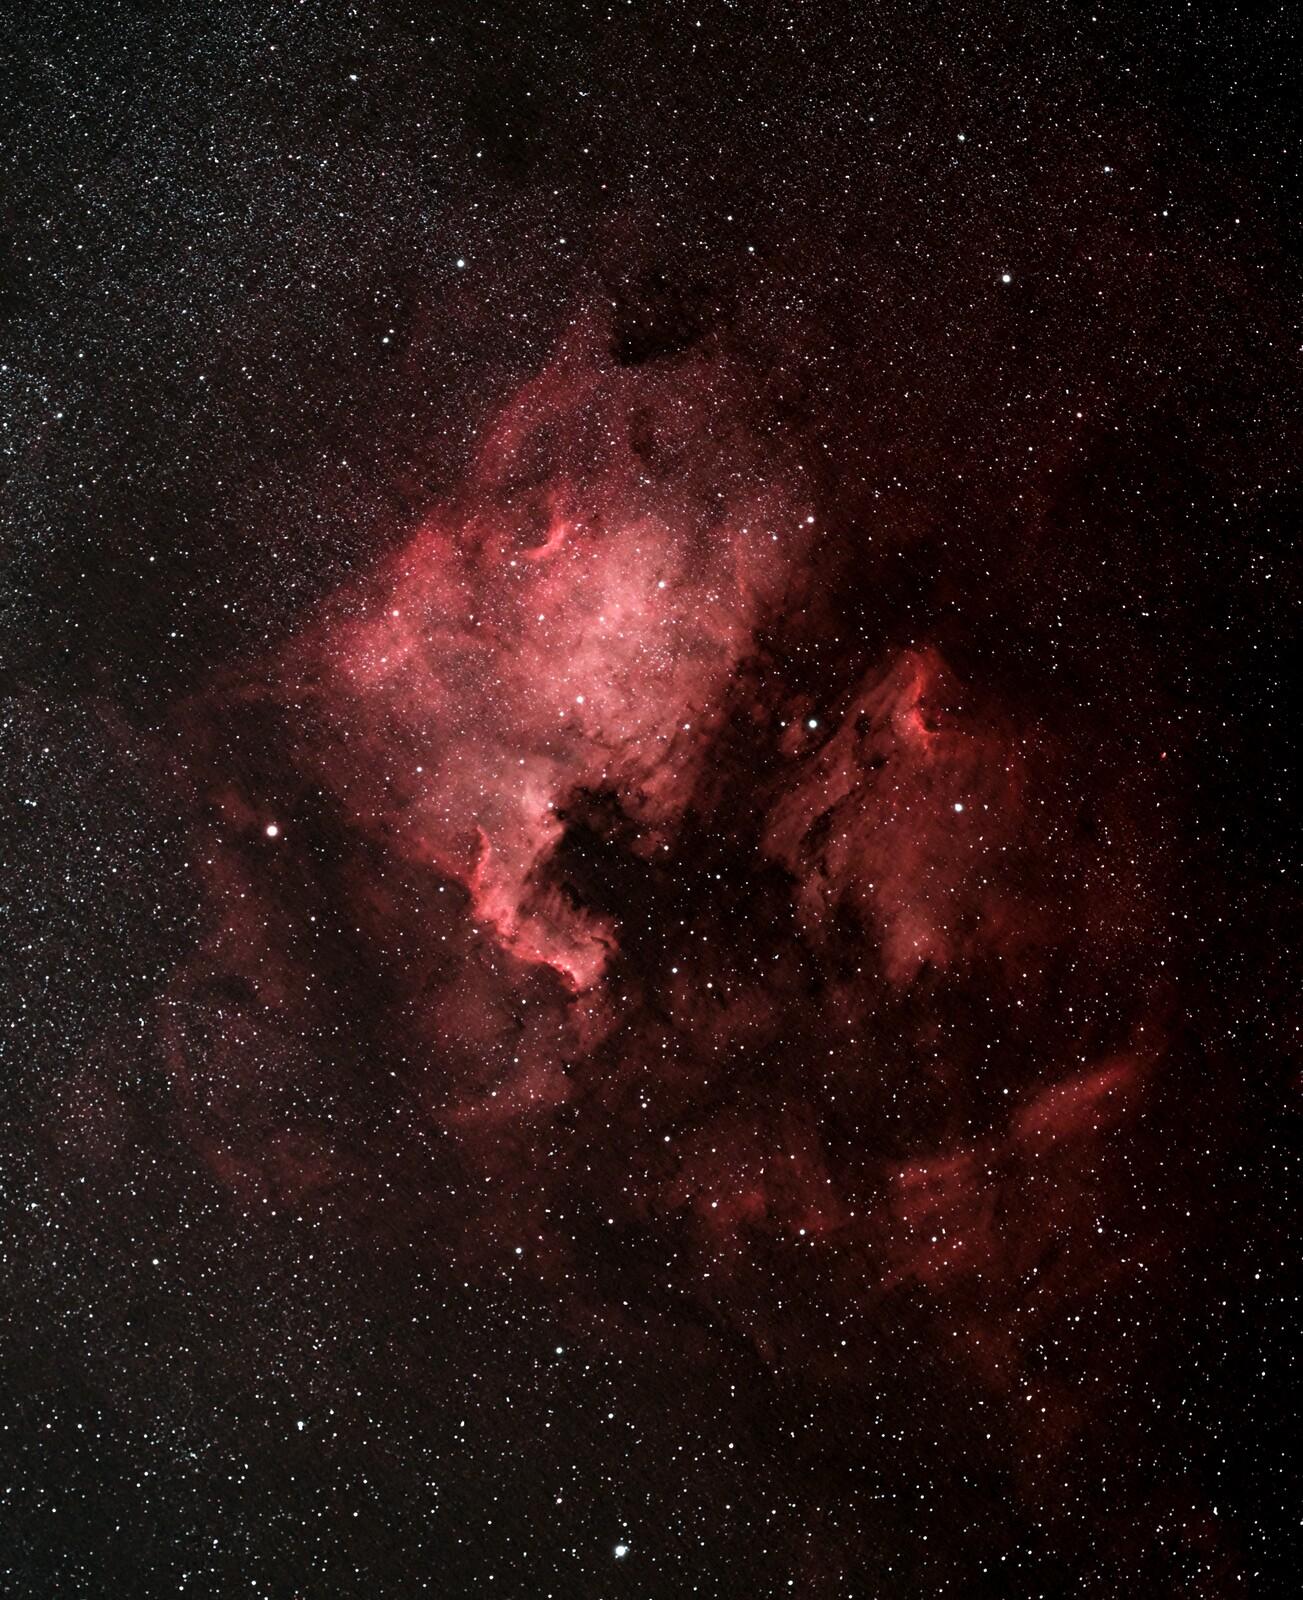 North America Nebula - Spacecat 51 First Light